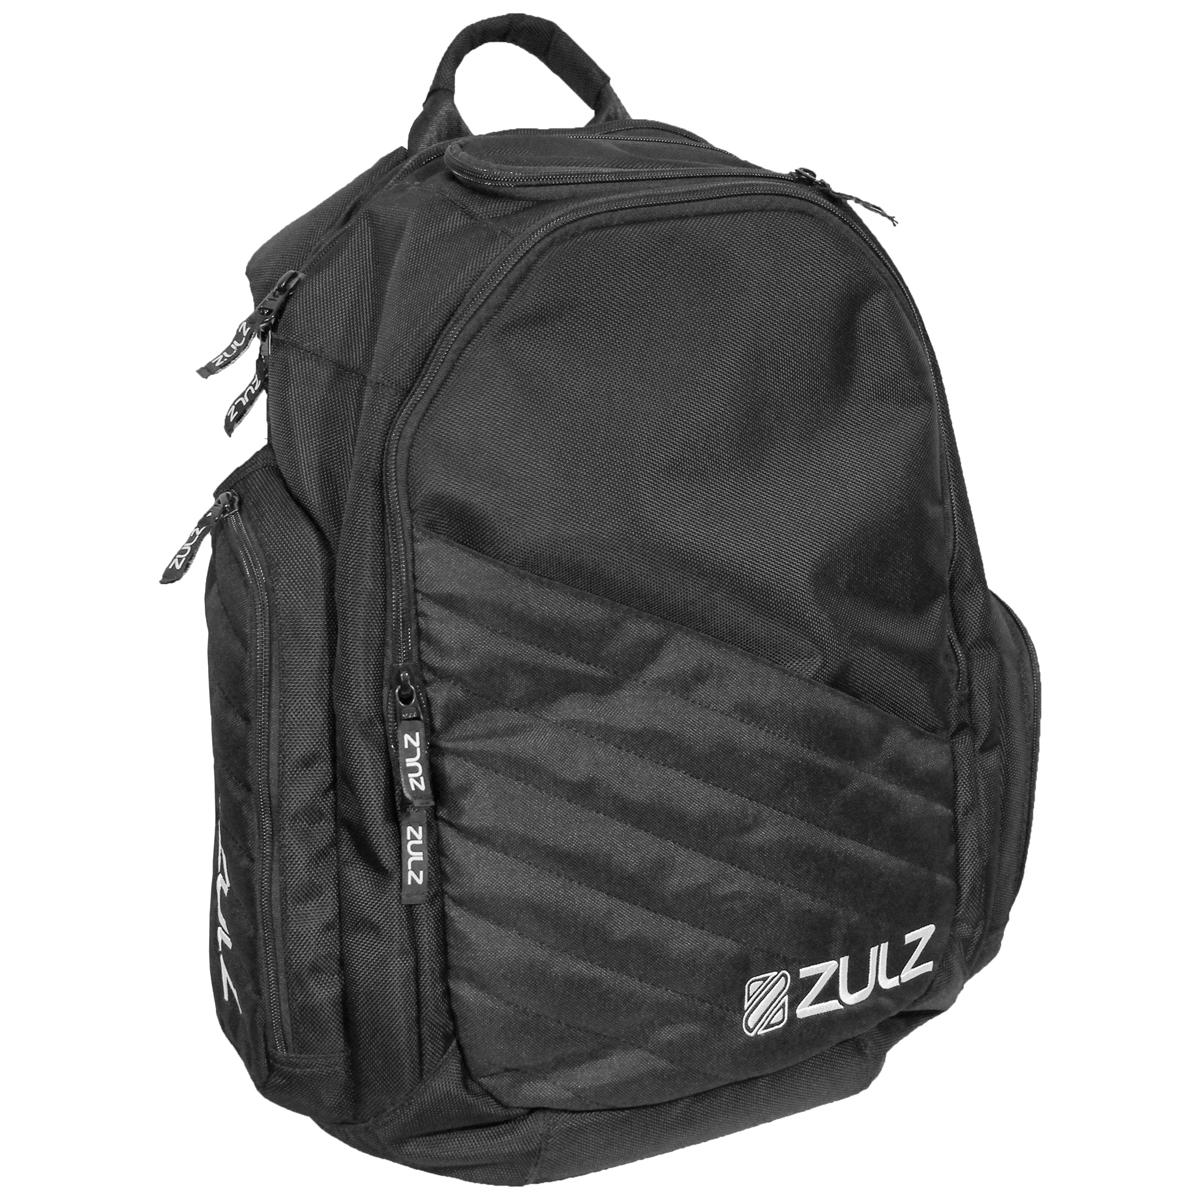 Zulz Pivot Black/Black Backpack